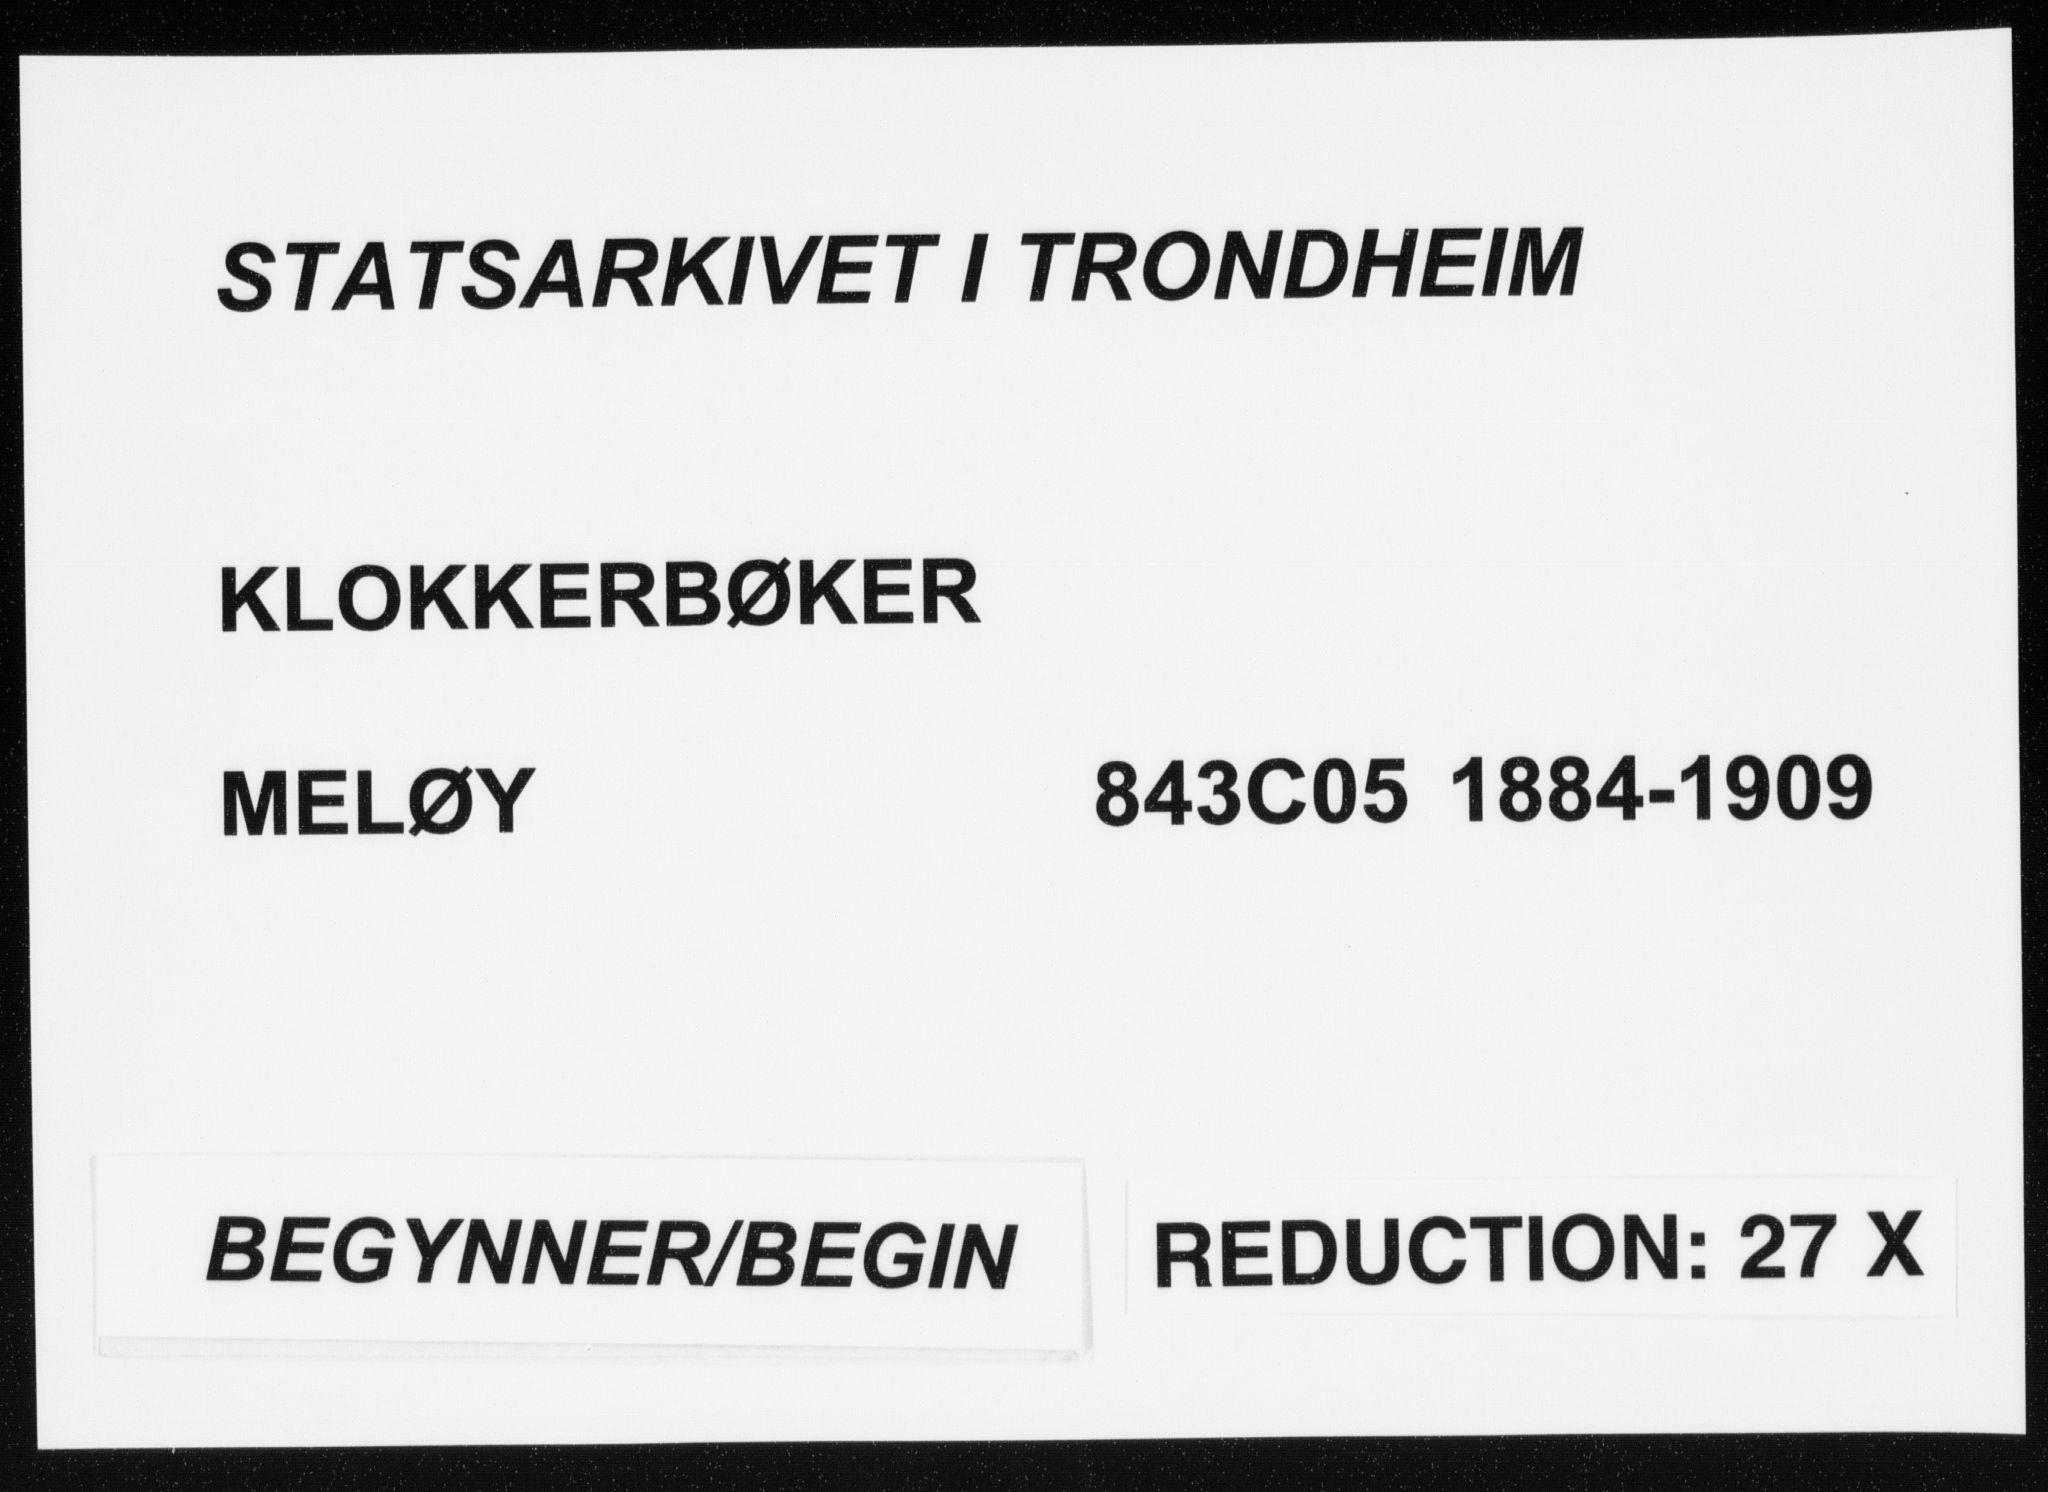 SAT, Ministerialprotokoller, klokkerbøker og fødselsregistre - Nordland, 843/L0636: Klokkerbok nr. 843C05, 1884-1909